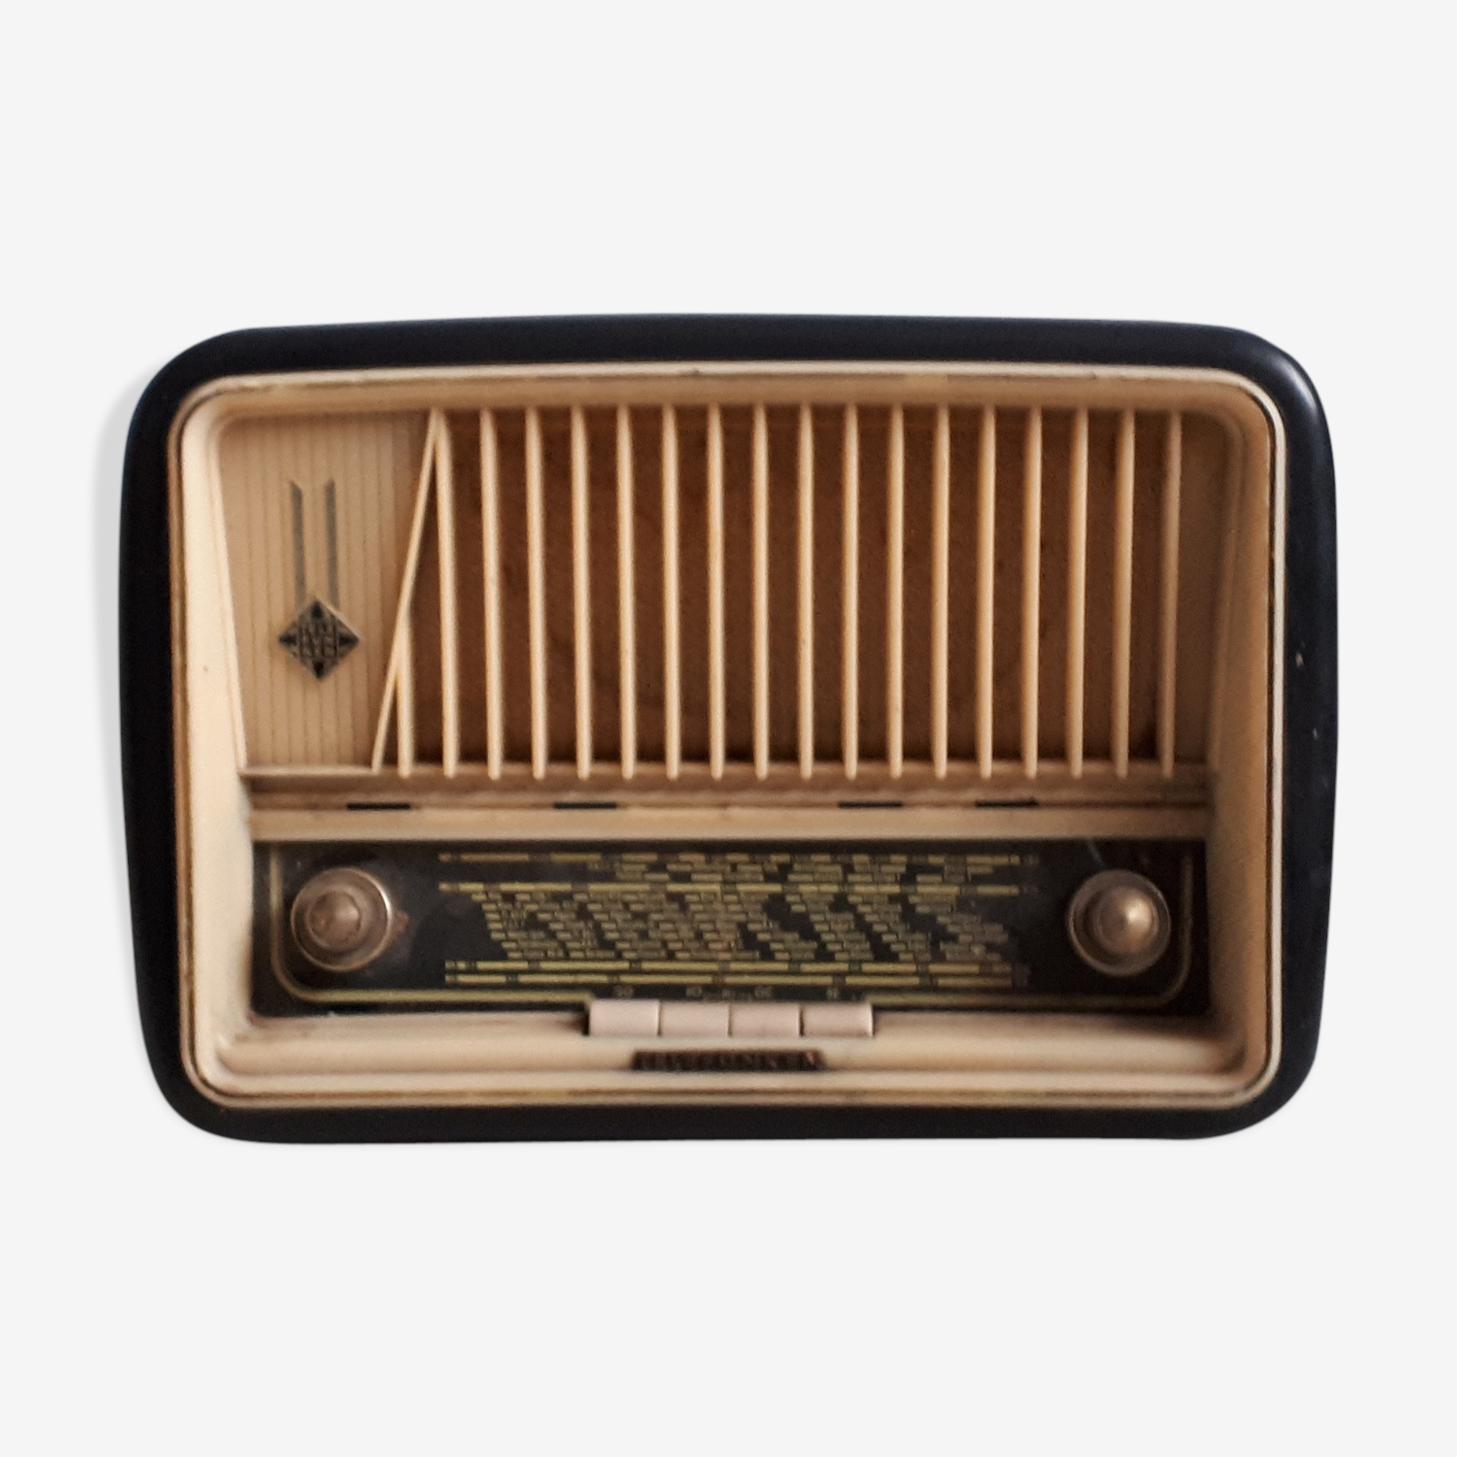 Radio vintage Telefunken